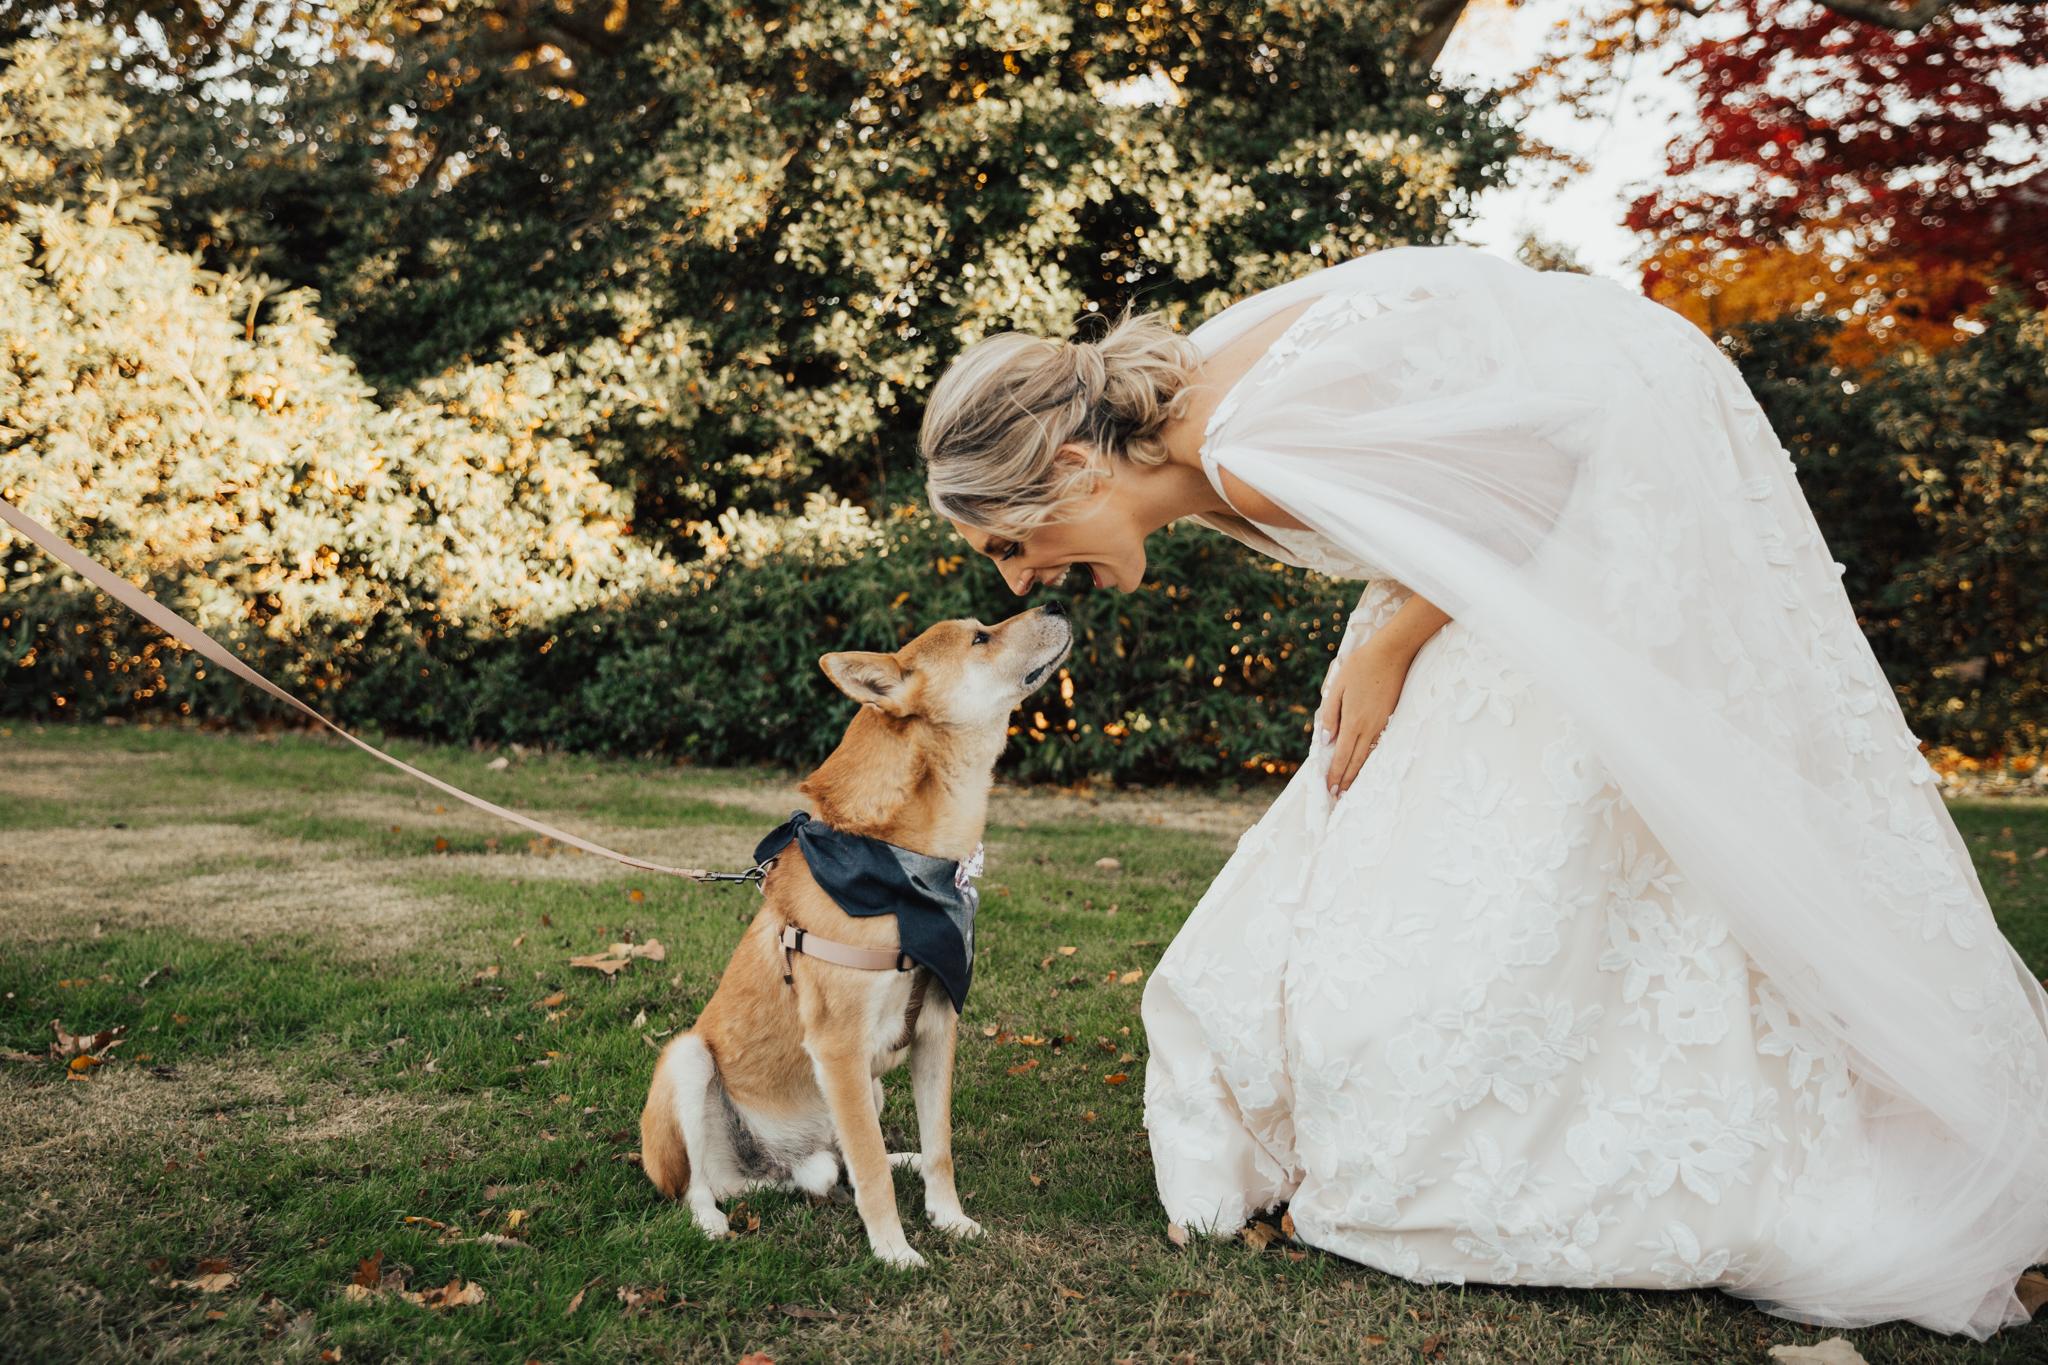 dog with bride wedding day